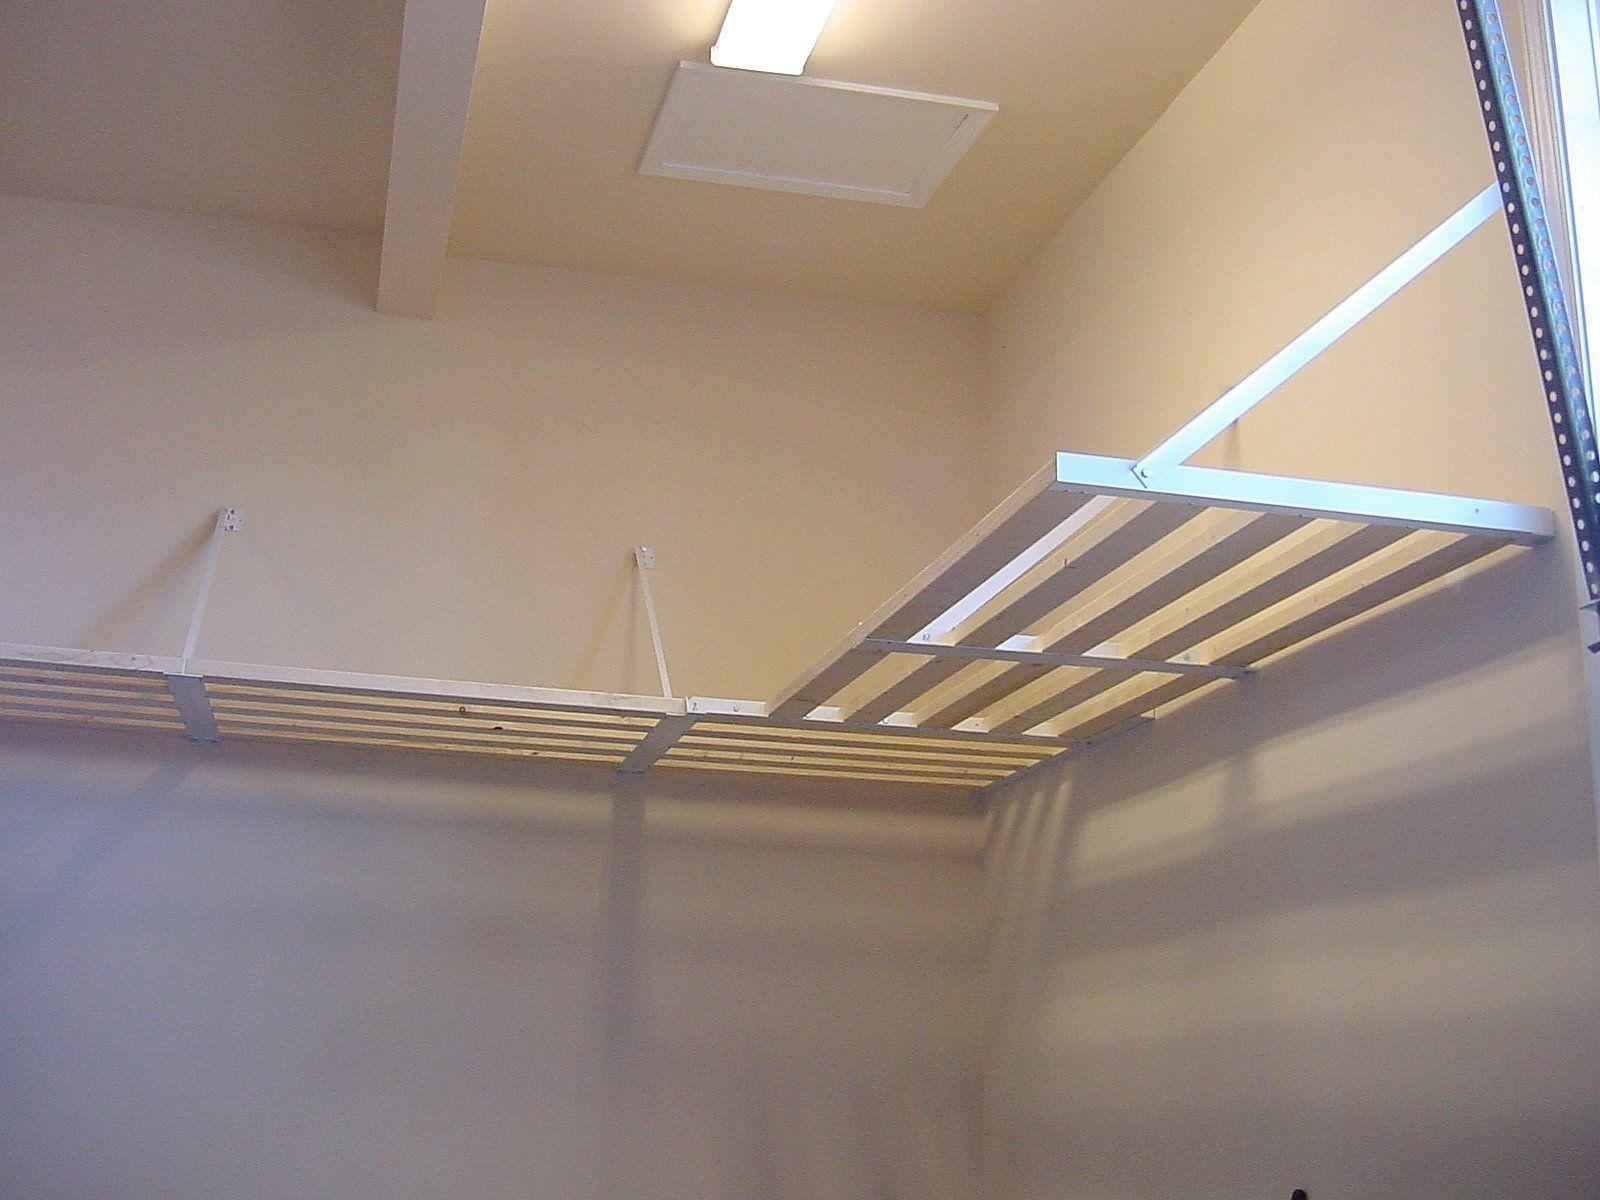 The Rhino Shelf Corner Quickstart Kit is easy-to-install, quality